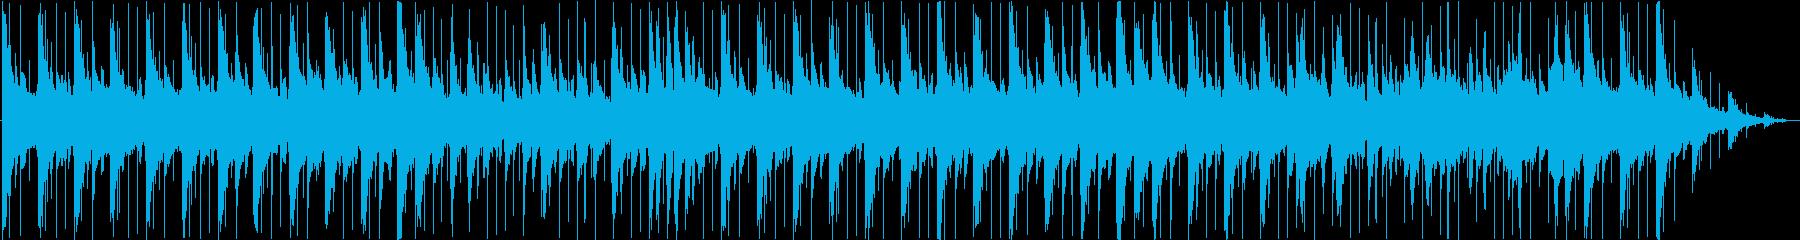 Melancholy ballad song / piano in the rain's reproduced waveform